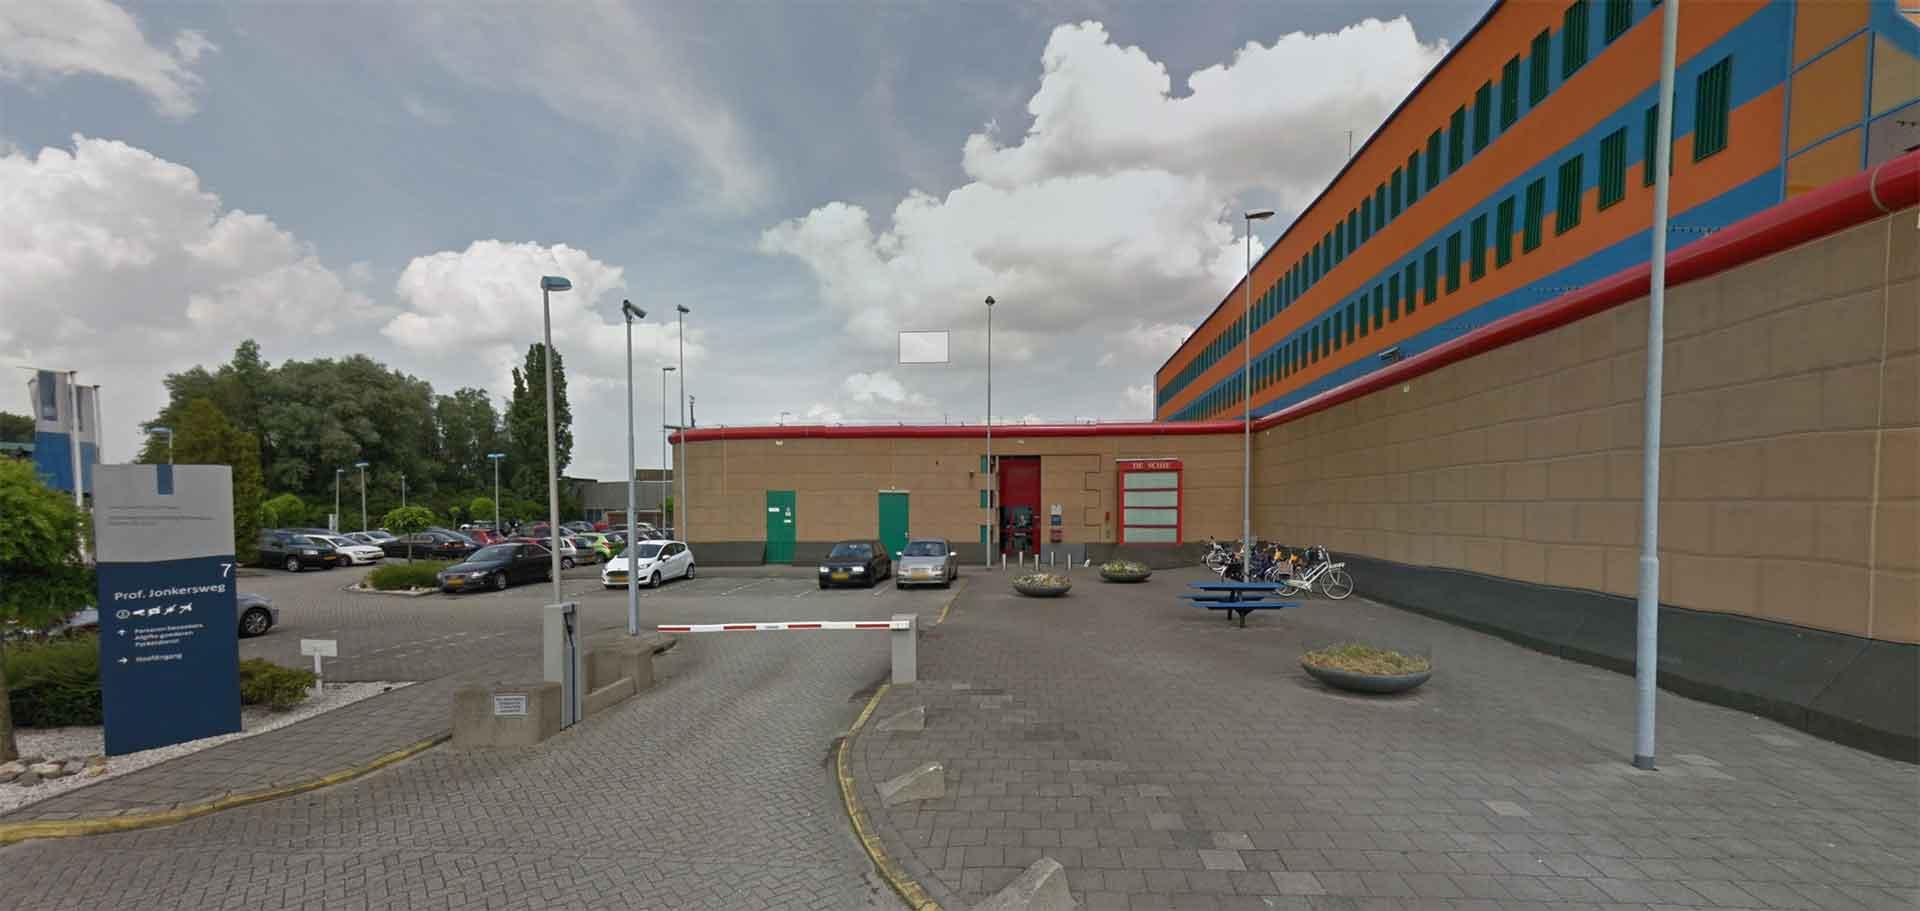 Penitentiaire Inrichting PI Rotterdam - Weening Strafrechtadvocaten